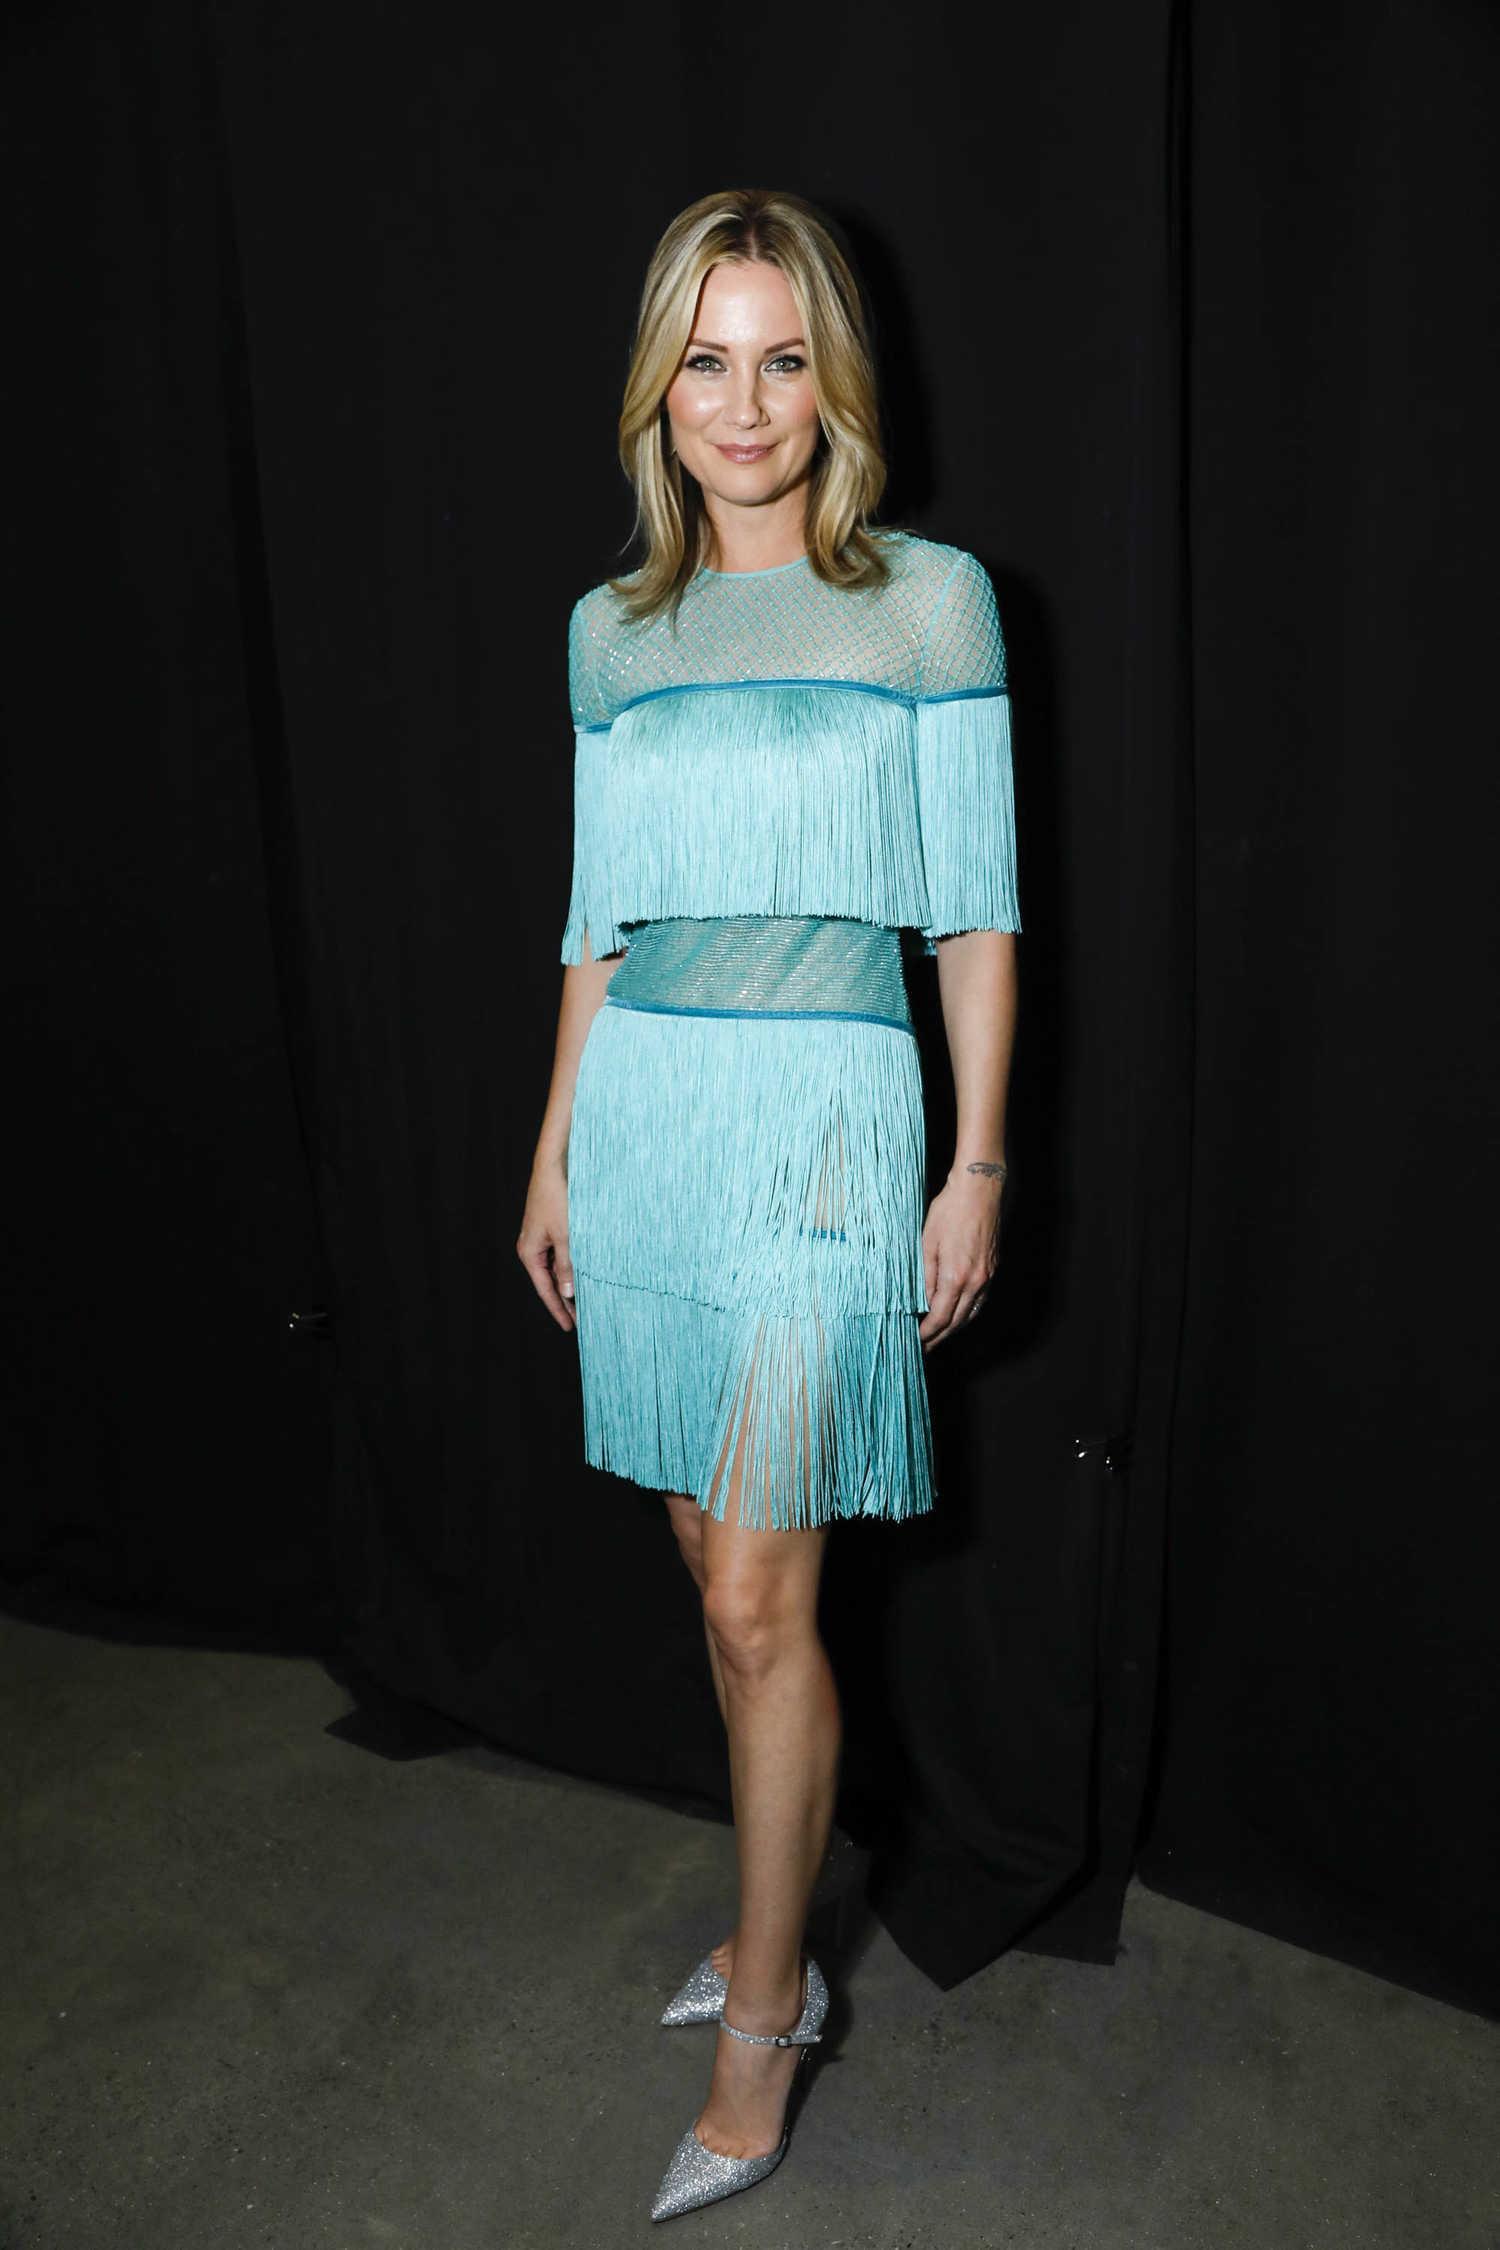 Jennifer Nettles At The Naeem Khan Fashion Show During New York Fashion Week In New York City